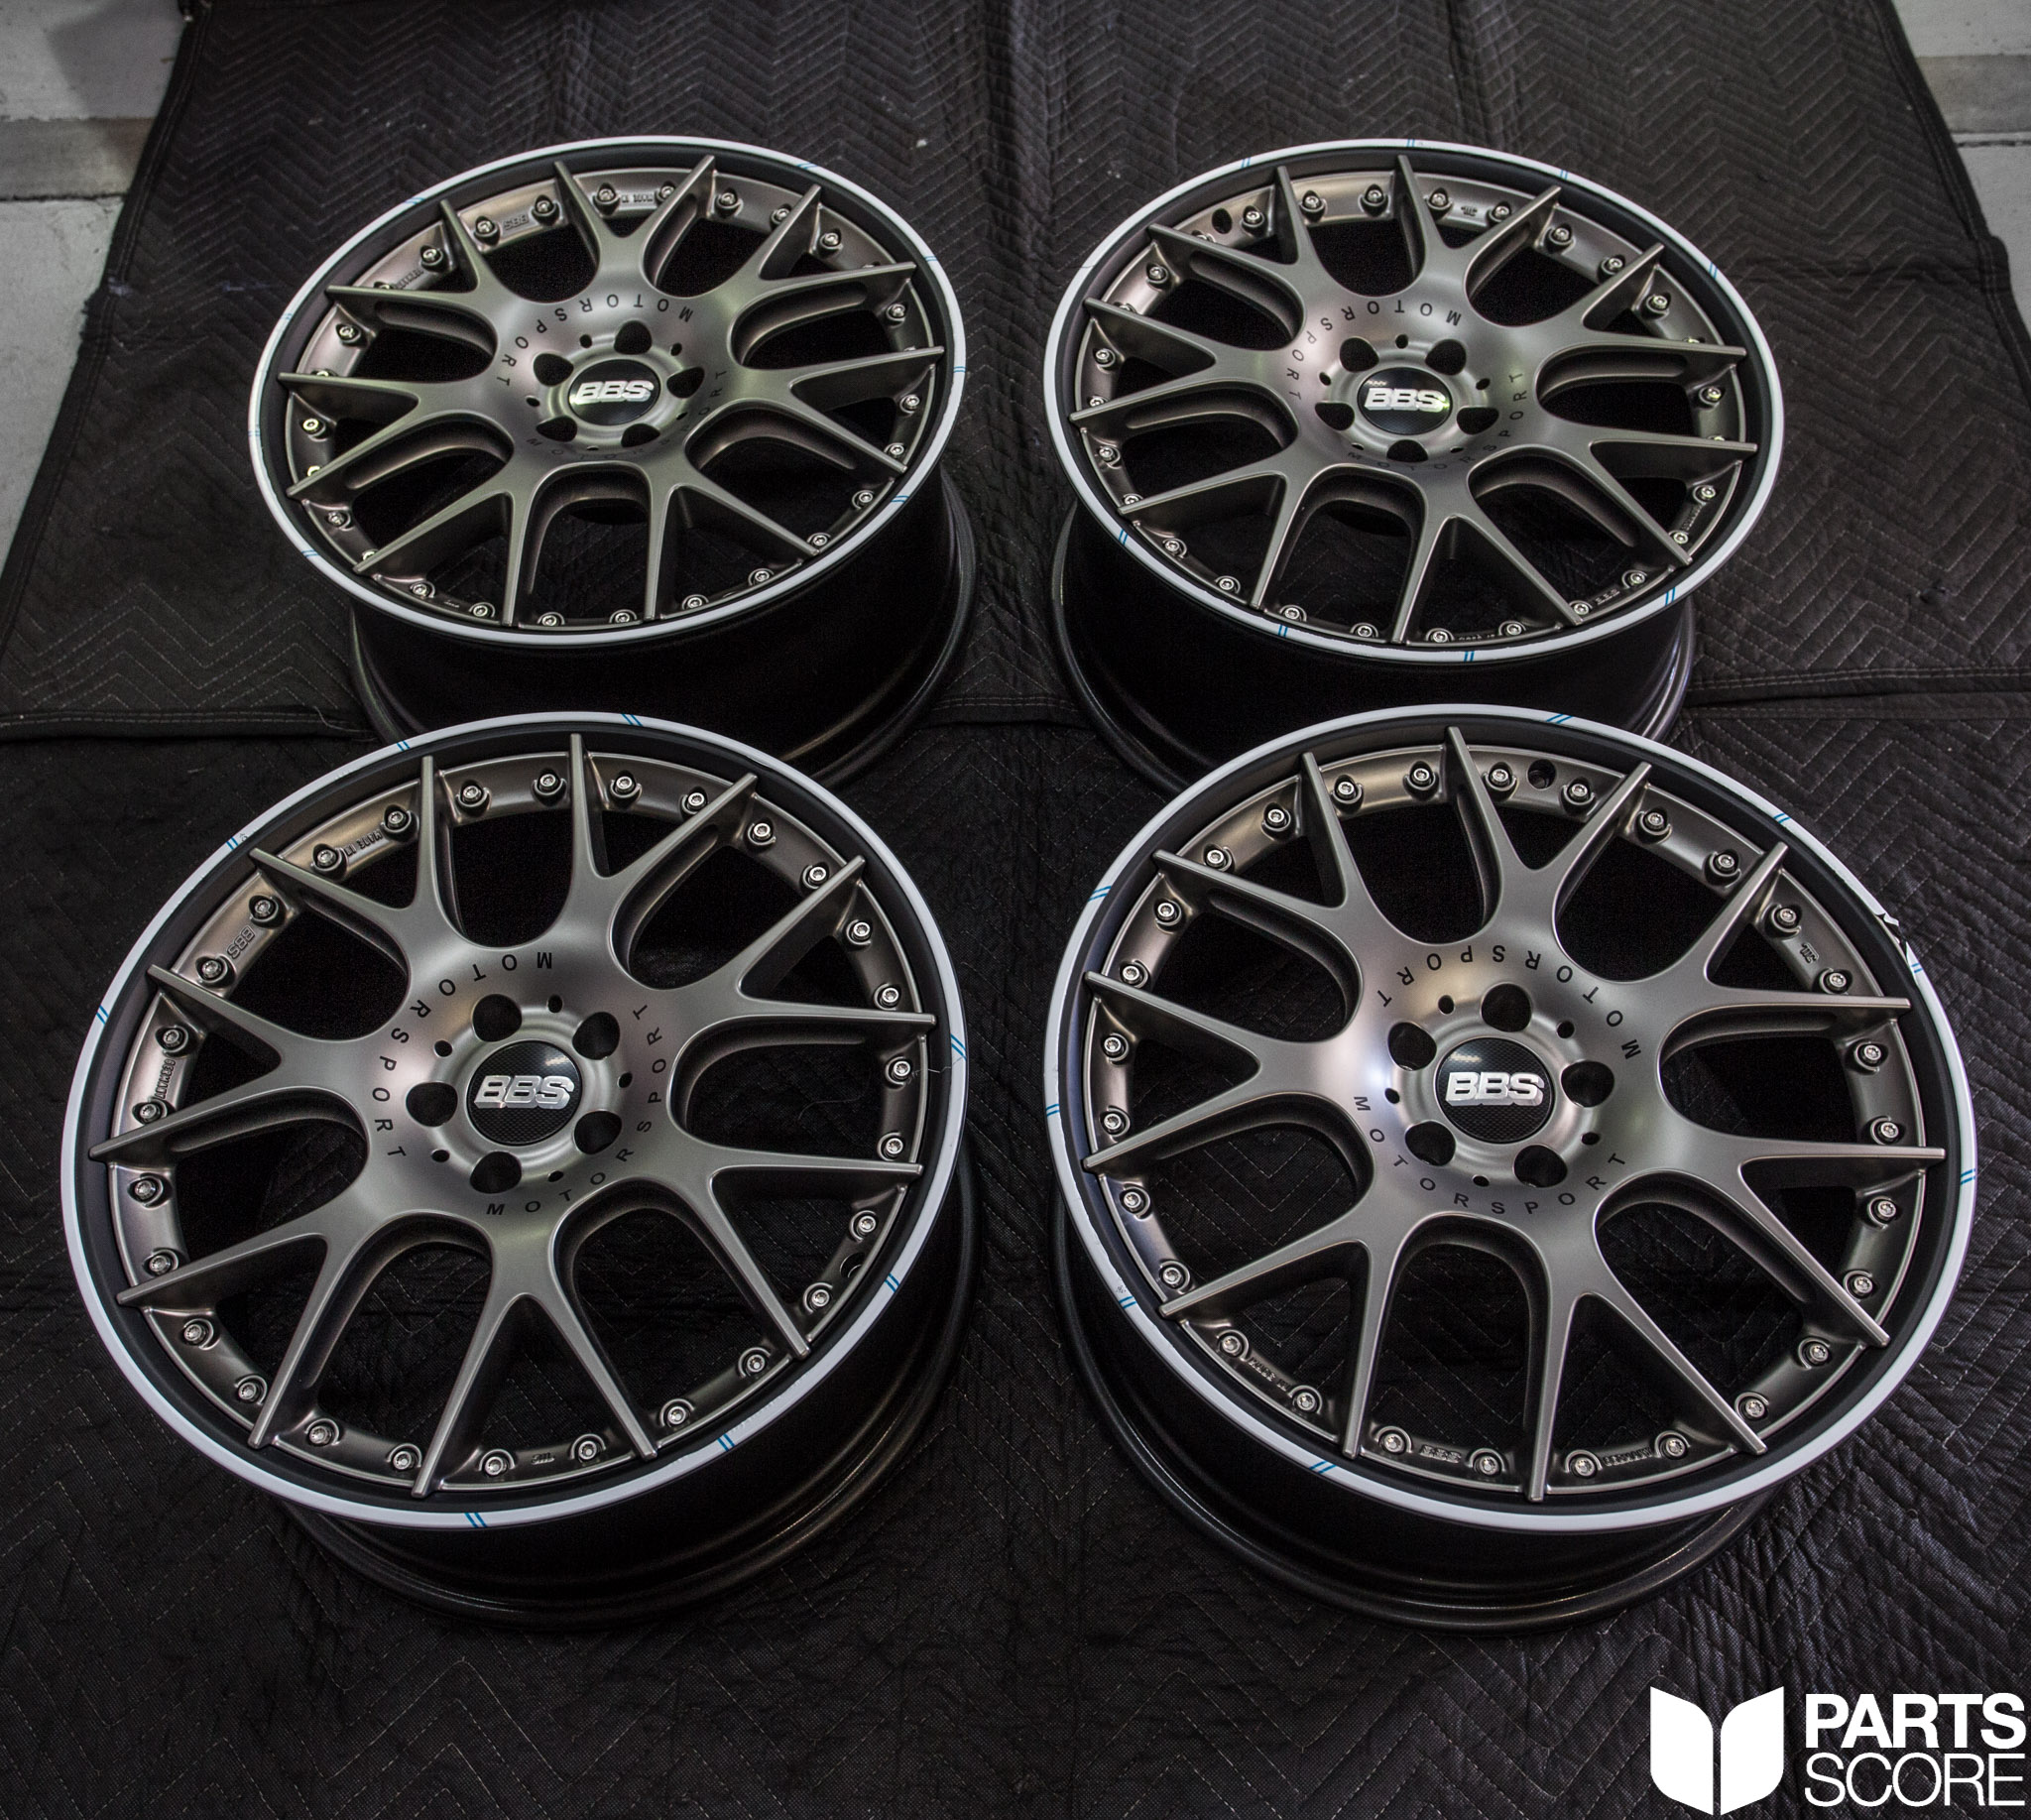 audi-b9-s4-20-bbs-chr-ii-wheels-installed-parts-score